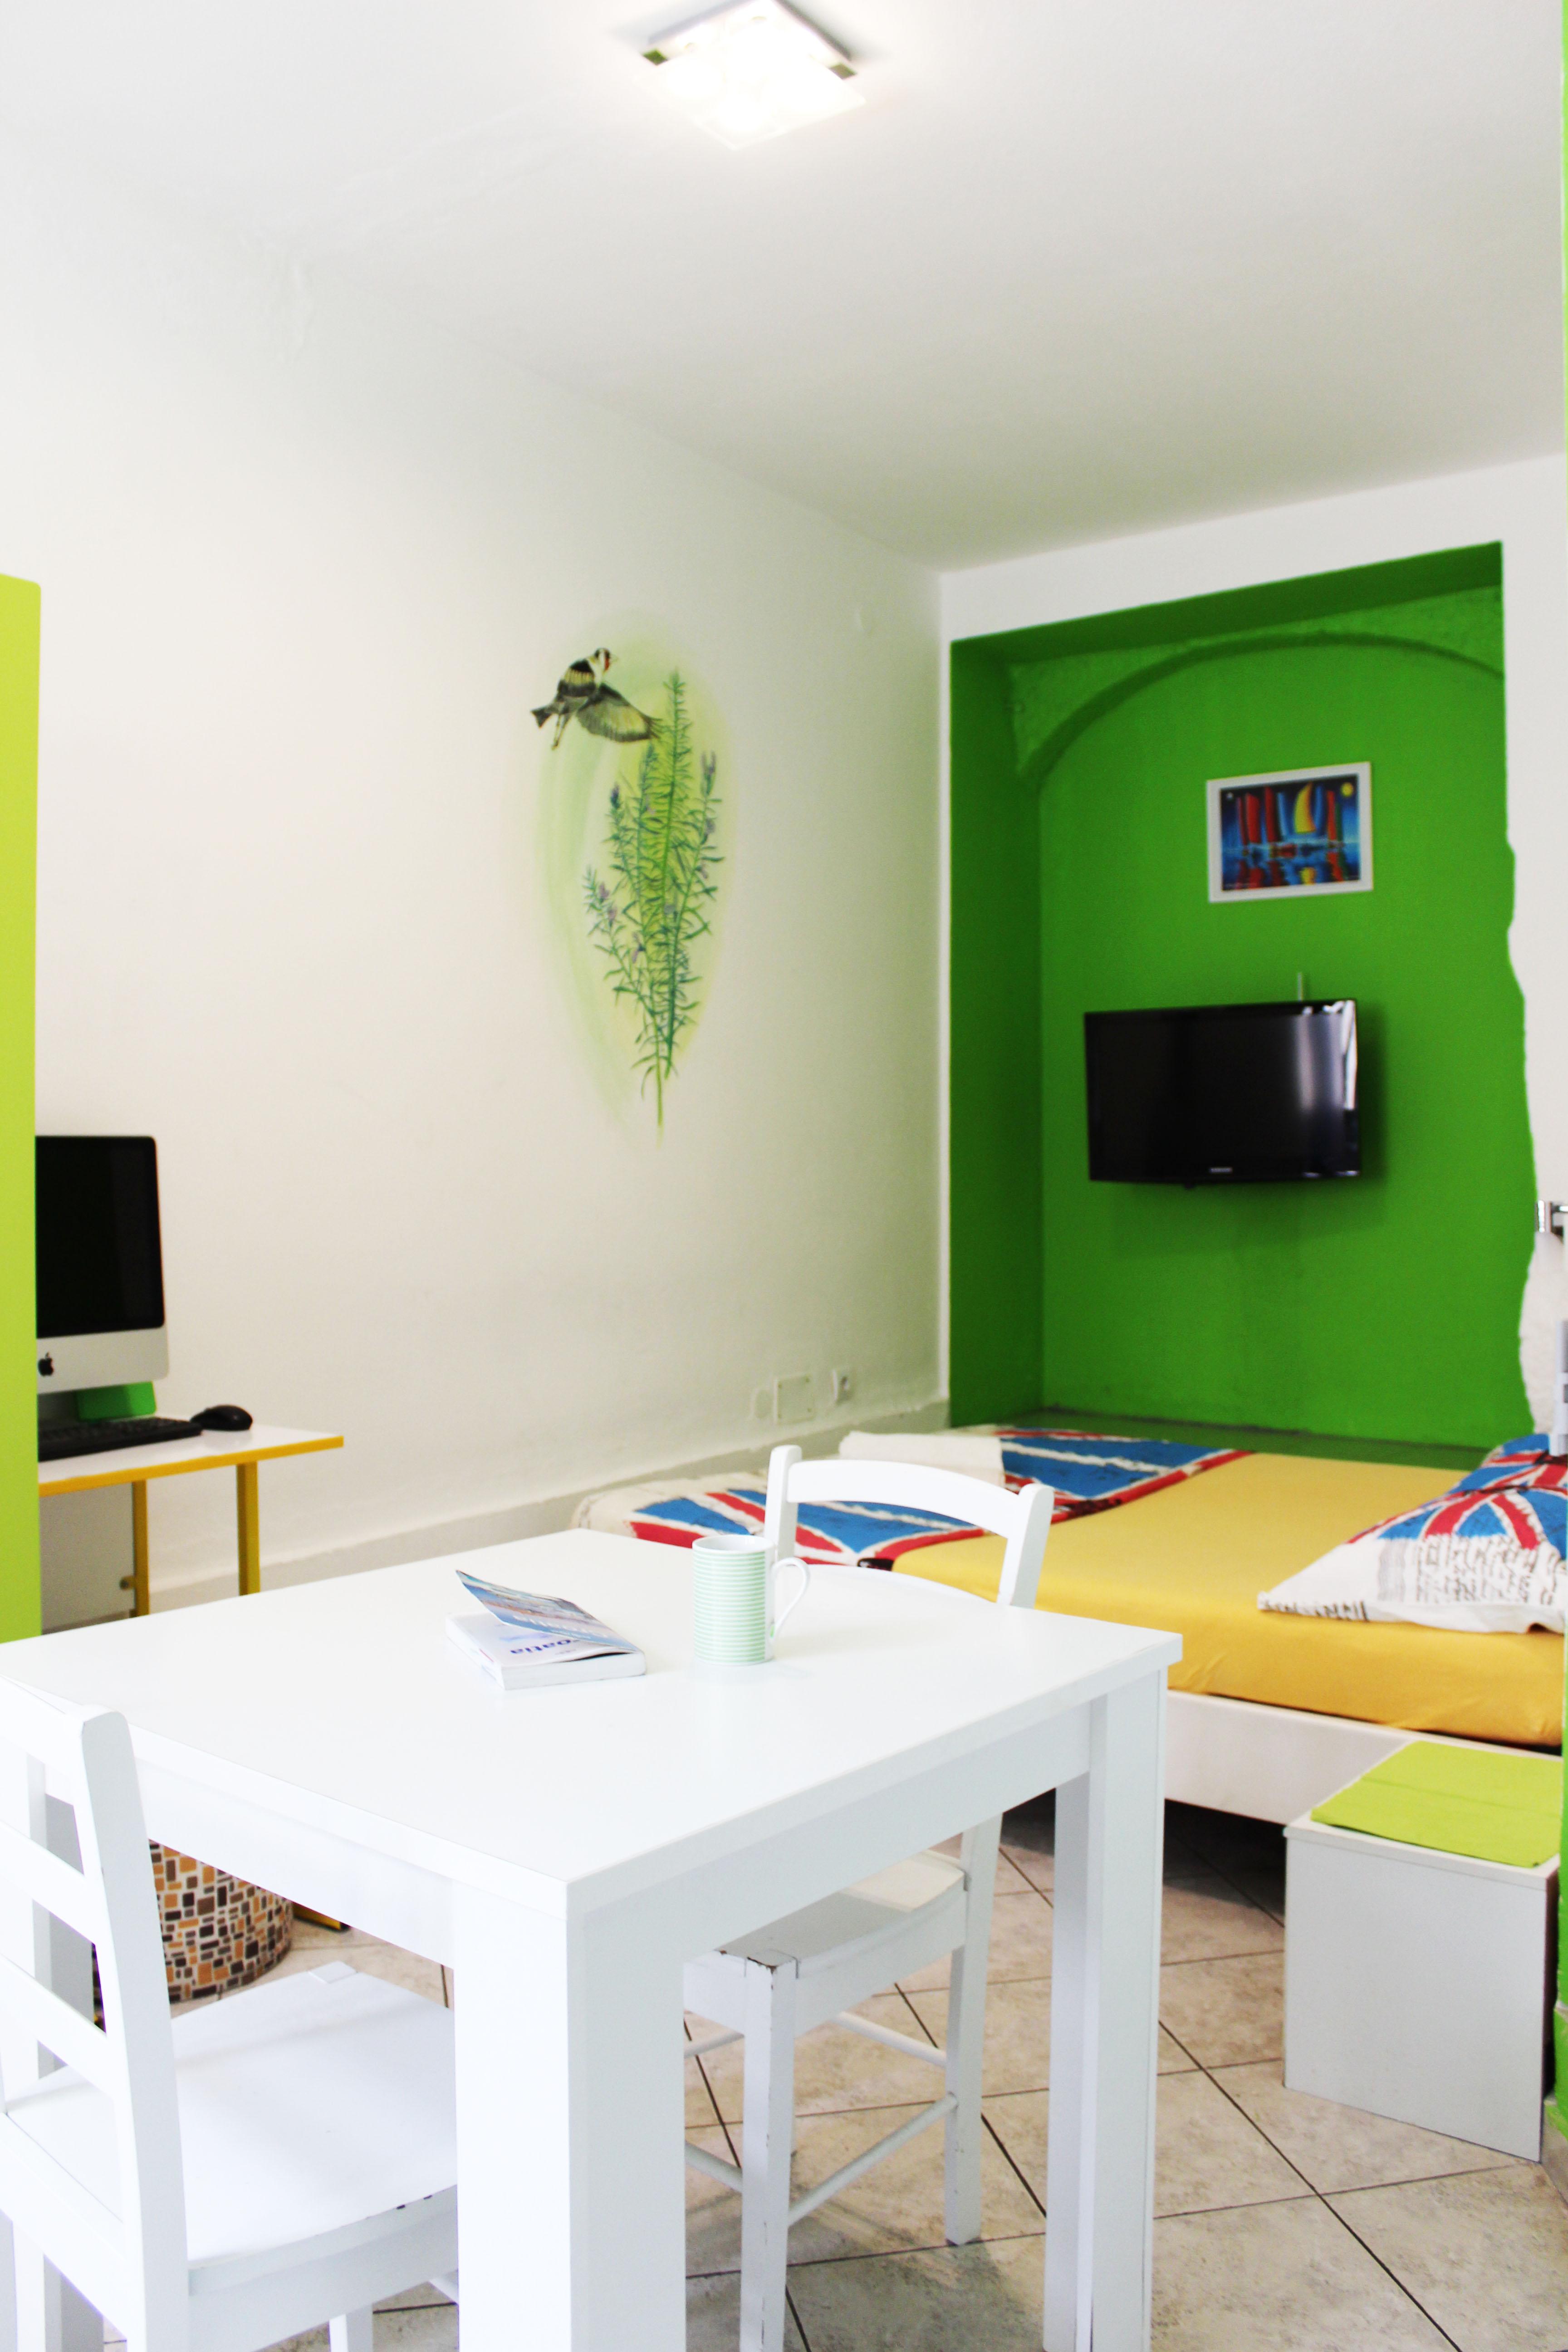 CroParadise Green Hostel